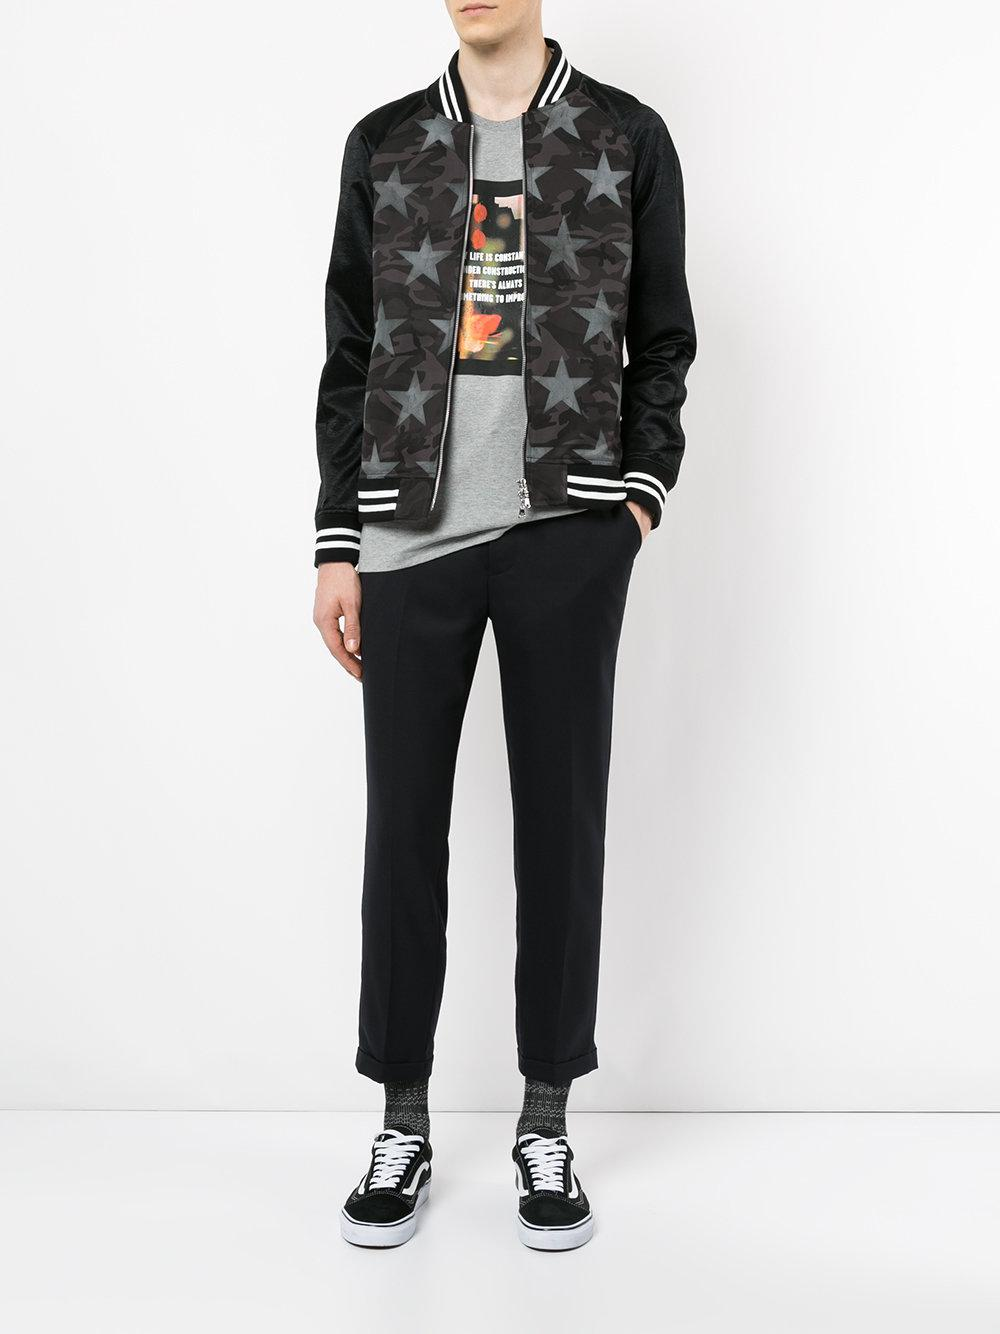 Guild Prime Cotton Star Print Jacket in Black for Men